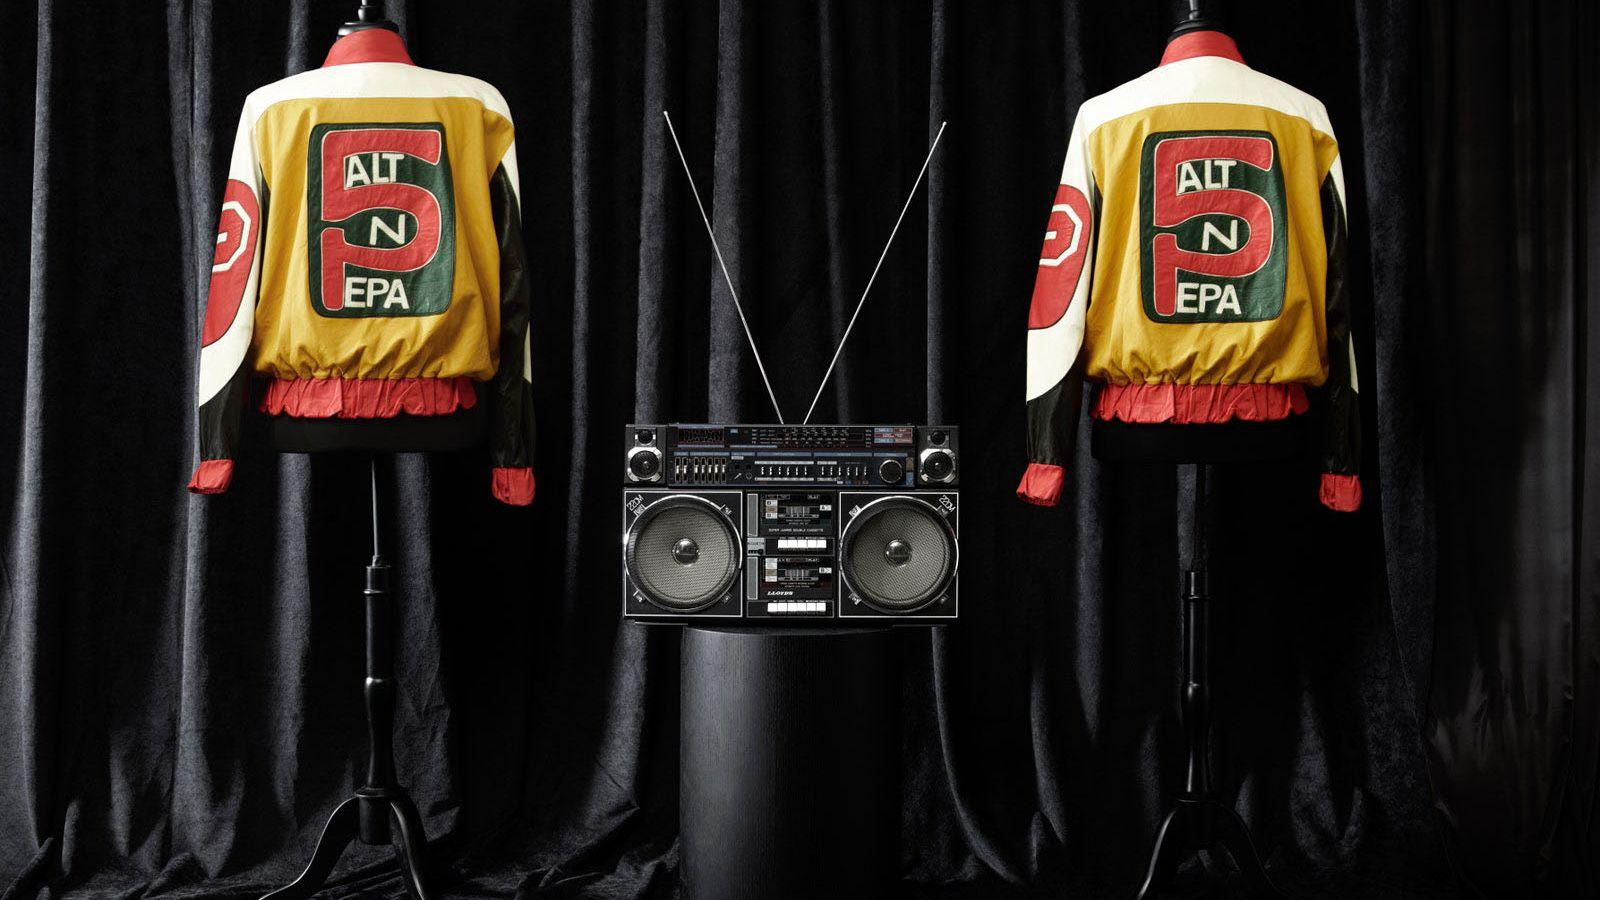 Hip Hop: Υψηλή ραπτική, κοσμήματα και αντικείμενα τέχνης σε μια ξεχωριστή δημοπρασία από τον οίκο Sotheby's